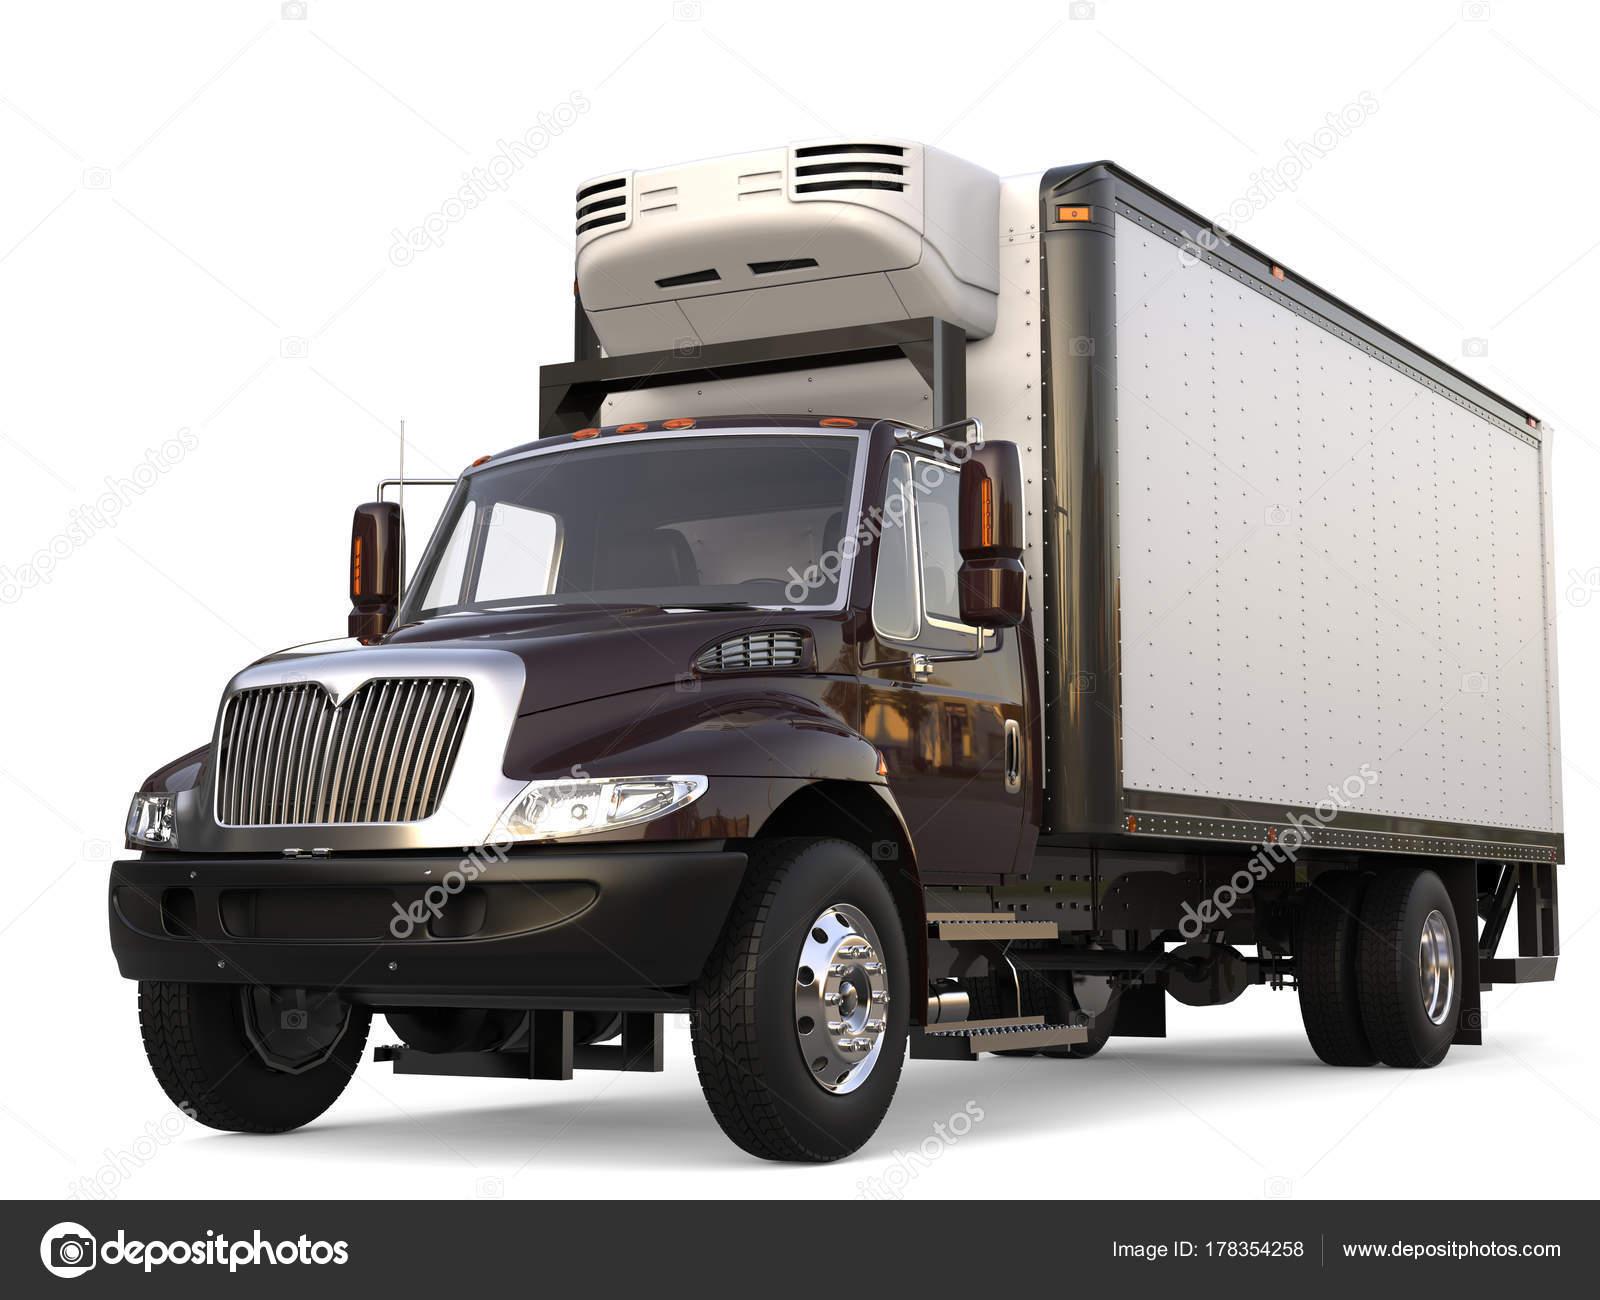 Kühlschrank Mit Auto Transportieren : Dunkel braun kühlschrank lkw ladung u stockfoto trimitrius